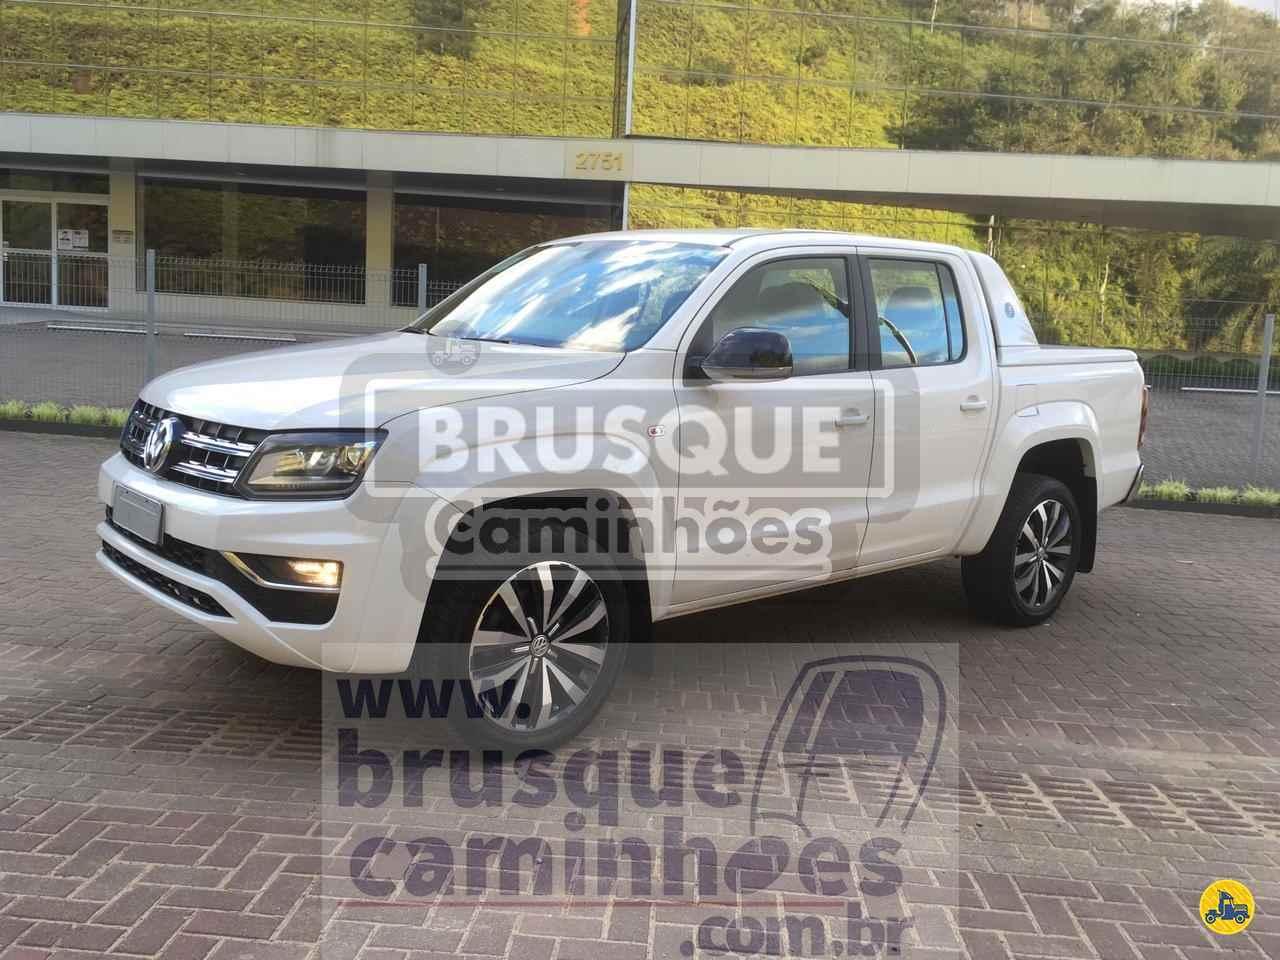 CARRO VW - Volkswagen Amarok V6 Highline  Brusque Caminhões BRUSQUE SANTA CATARINA SC